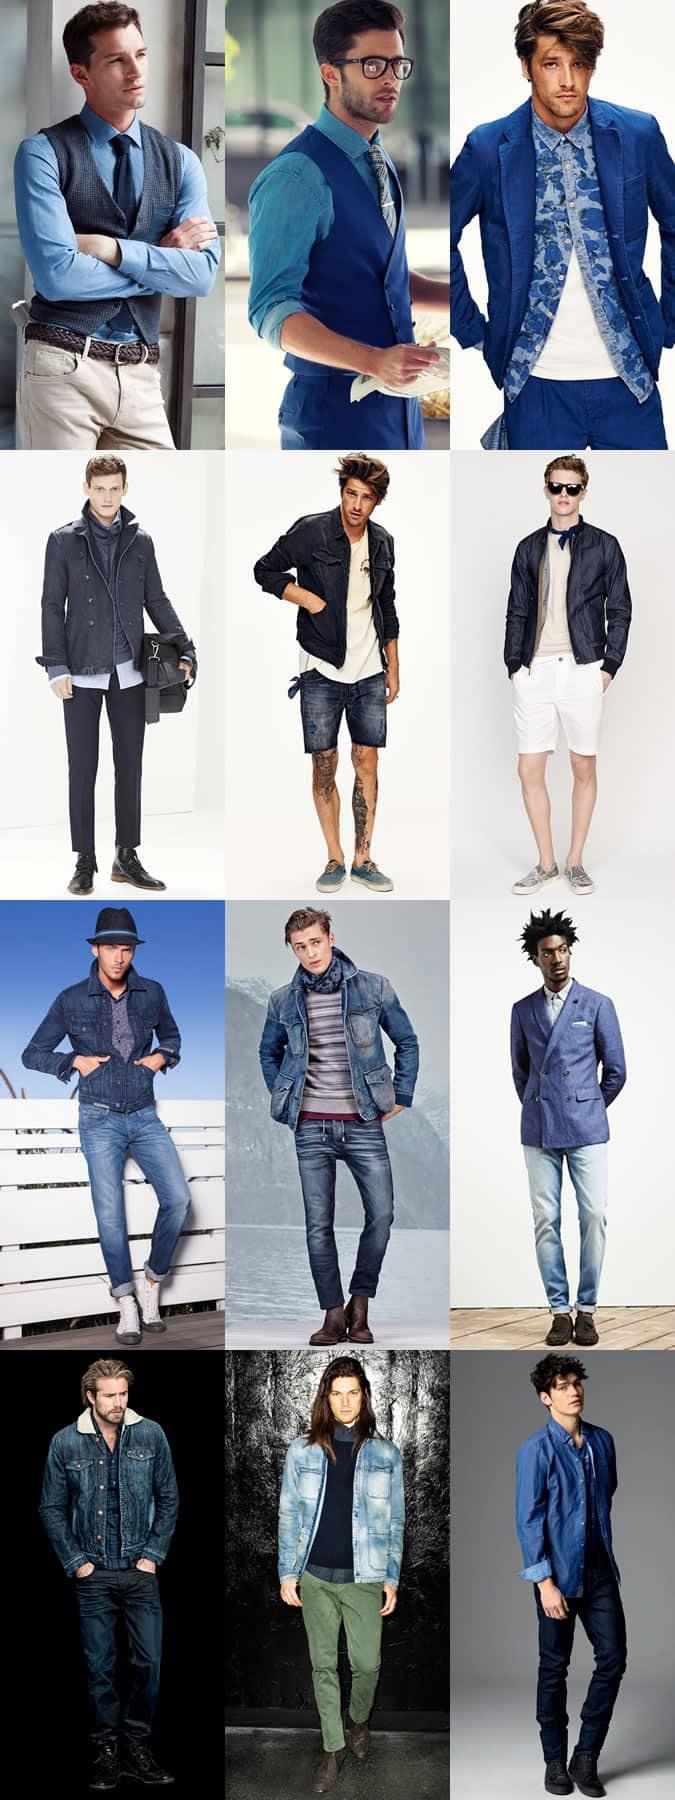 Men's Denim Jeans, Shirts, Blazers, Coats, Bomber Jackets Outfit Inspiration Lookbook